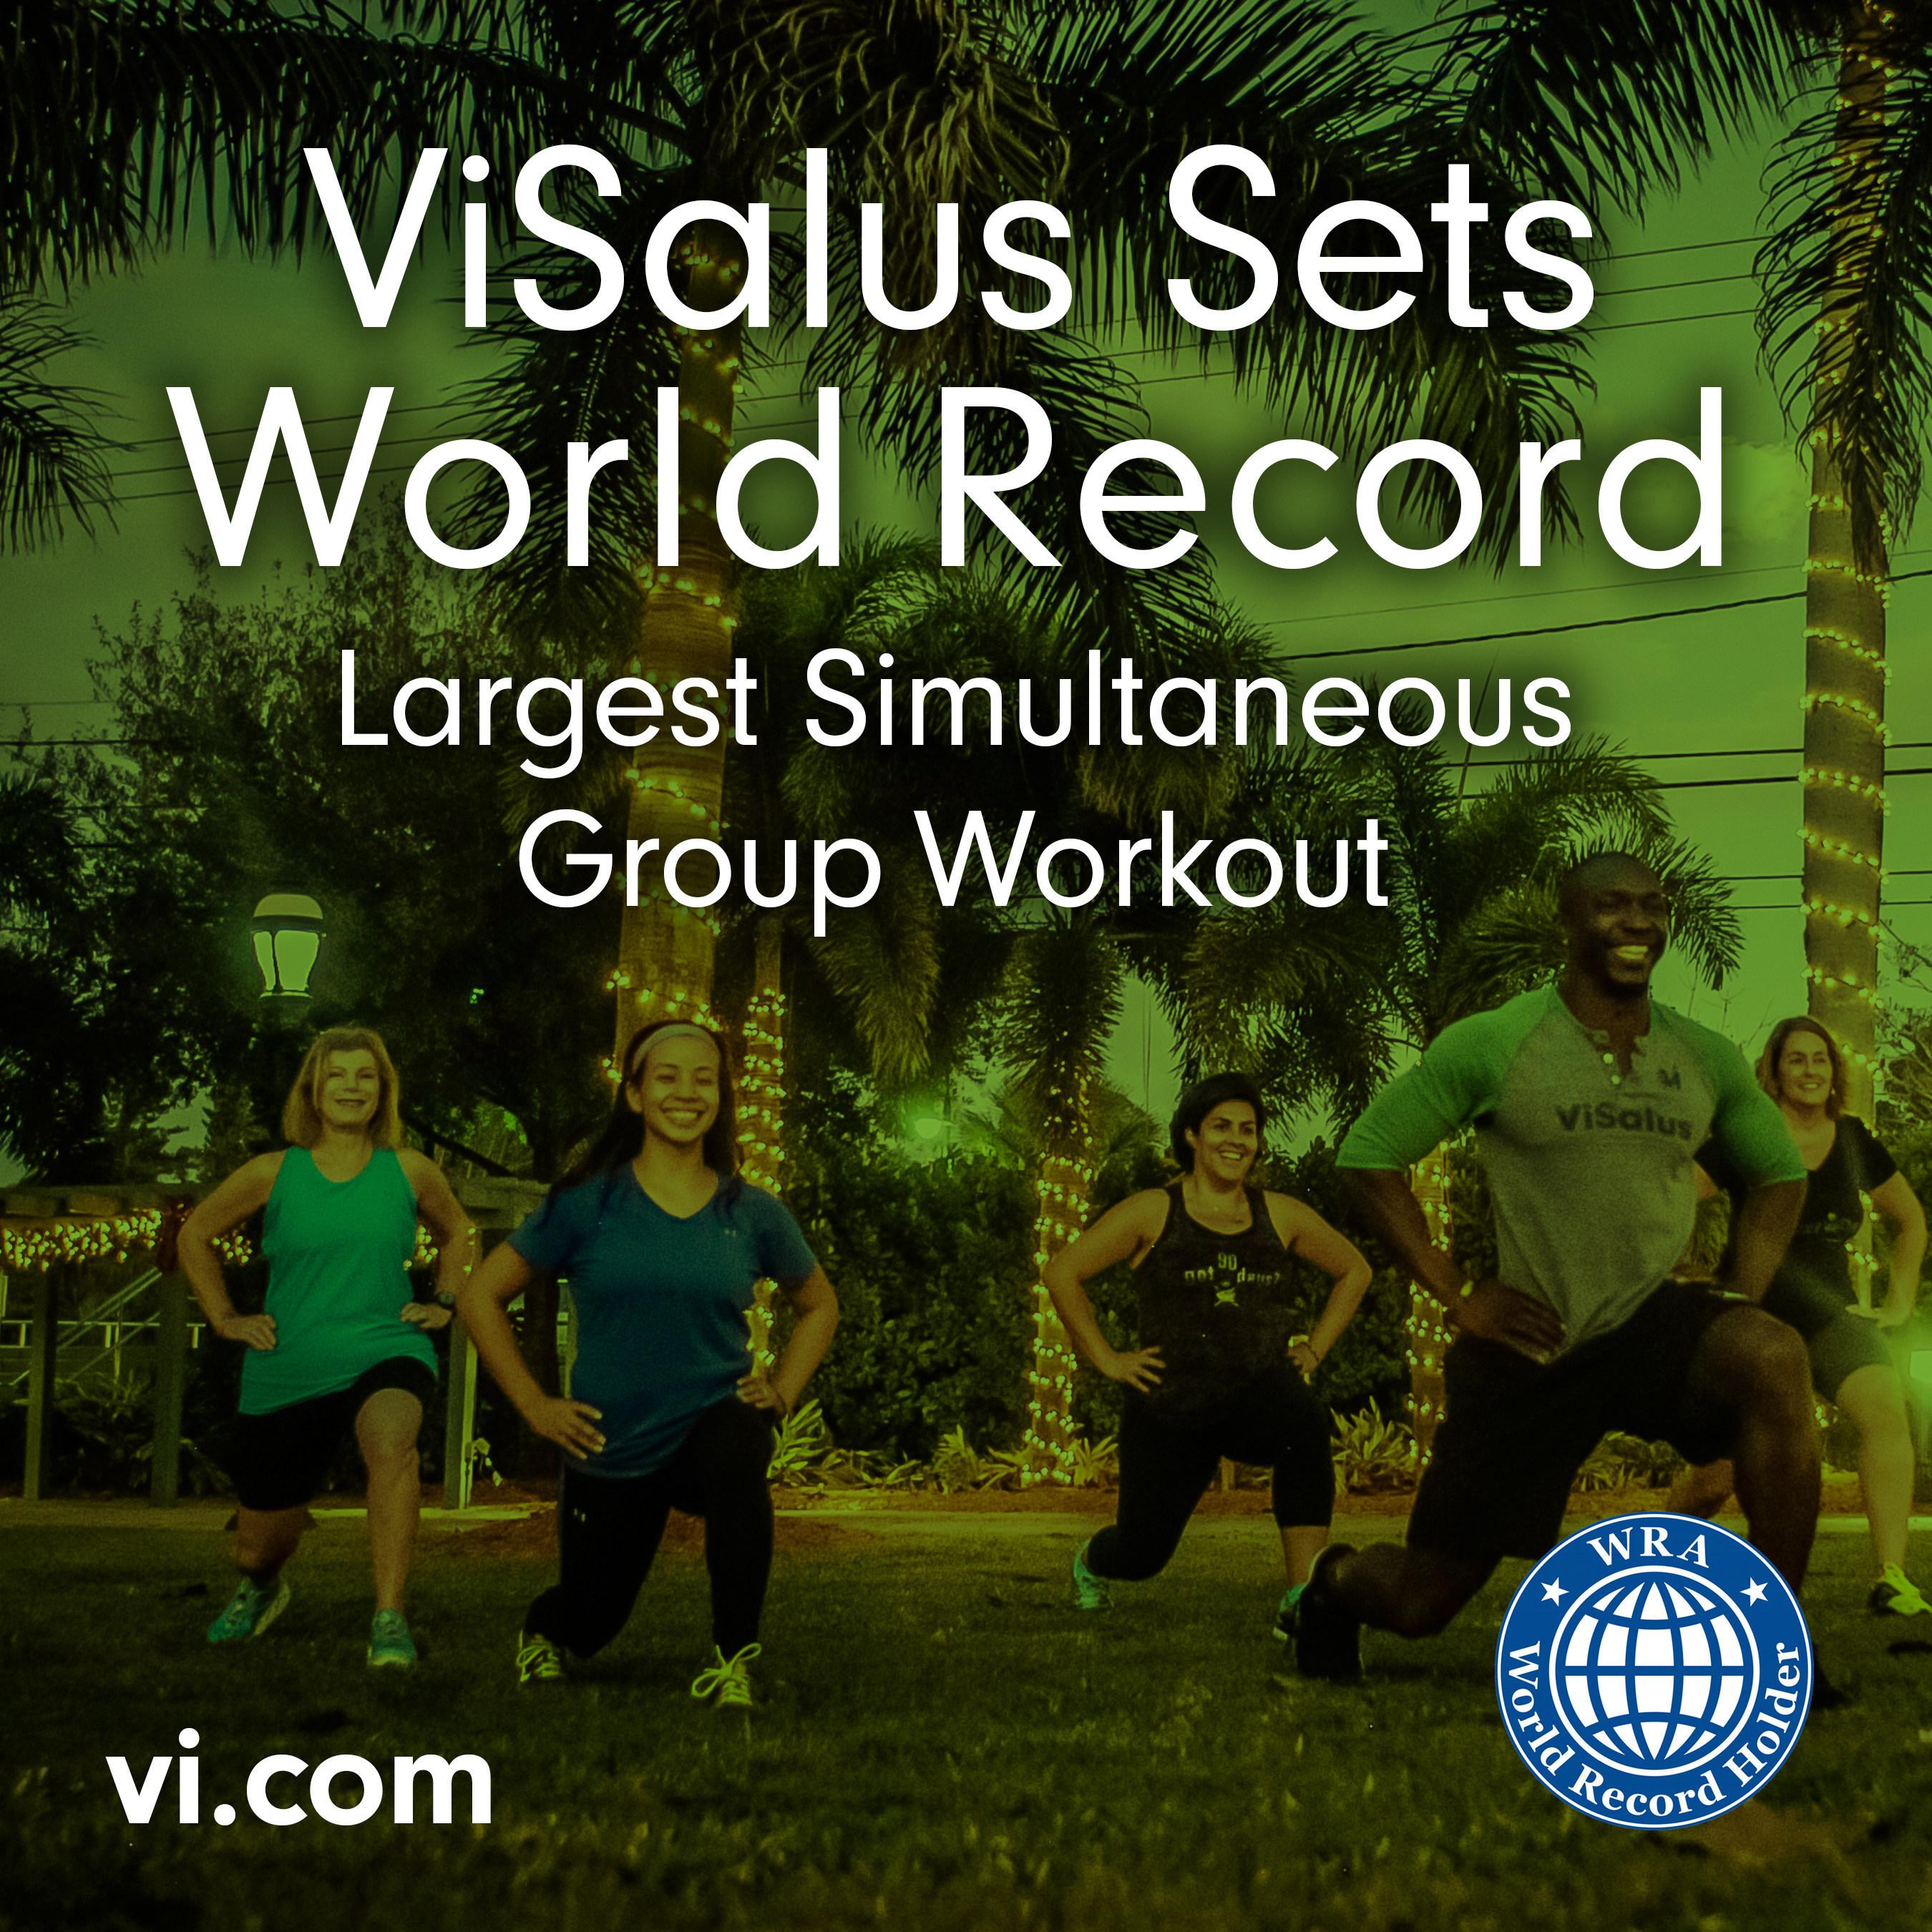 ViSalus Sets World Record